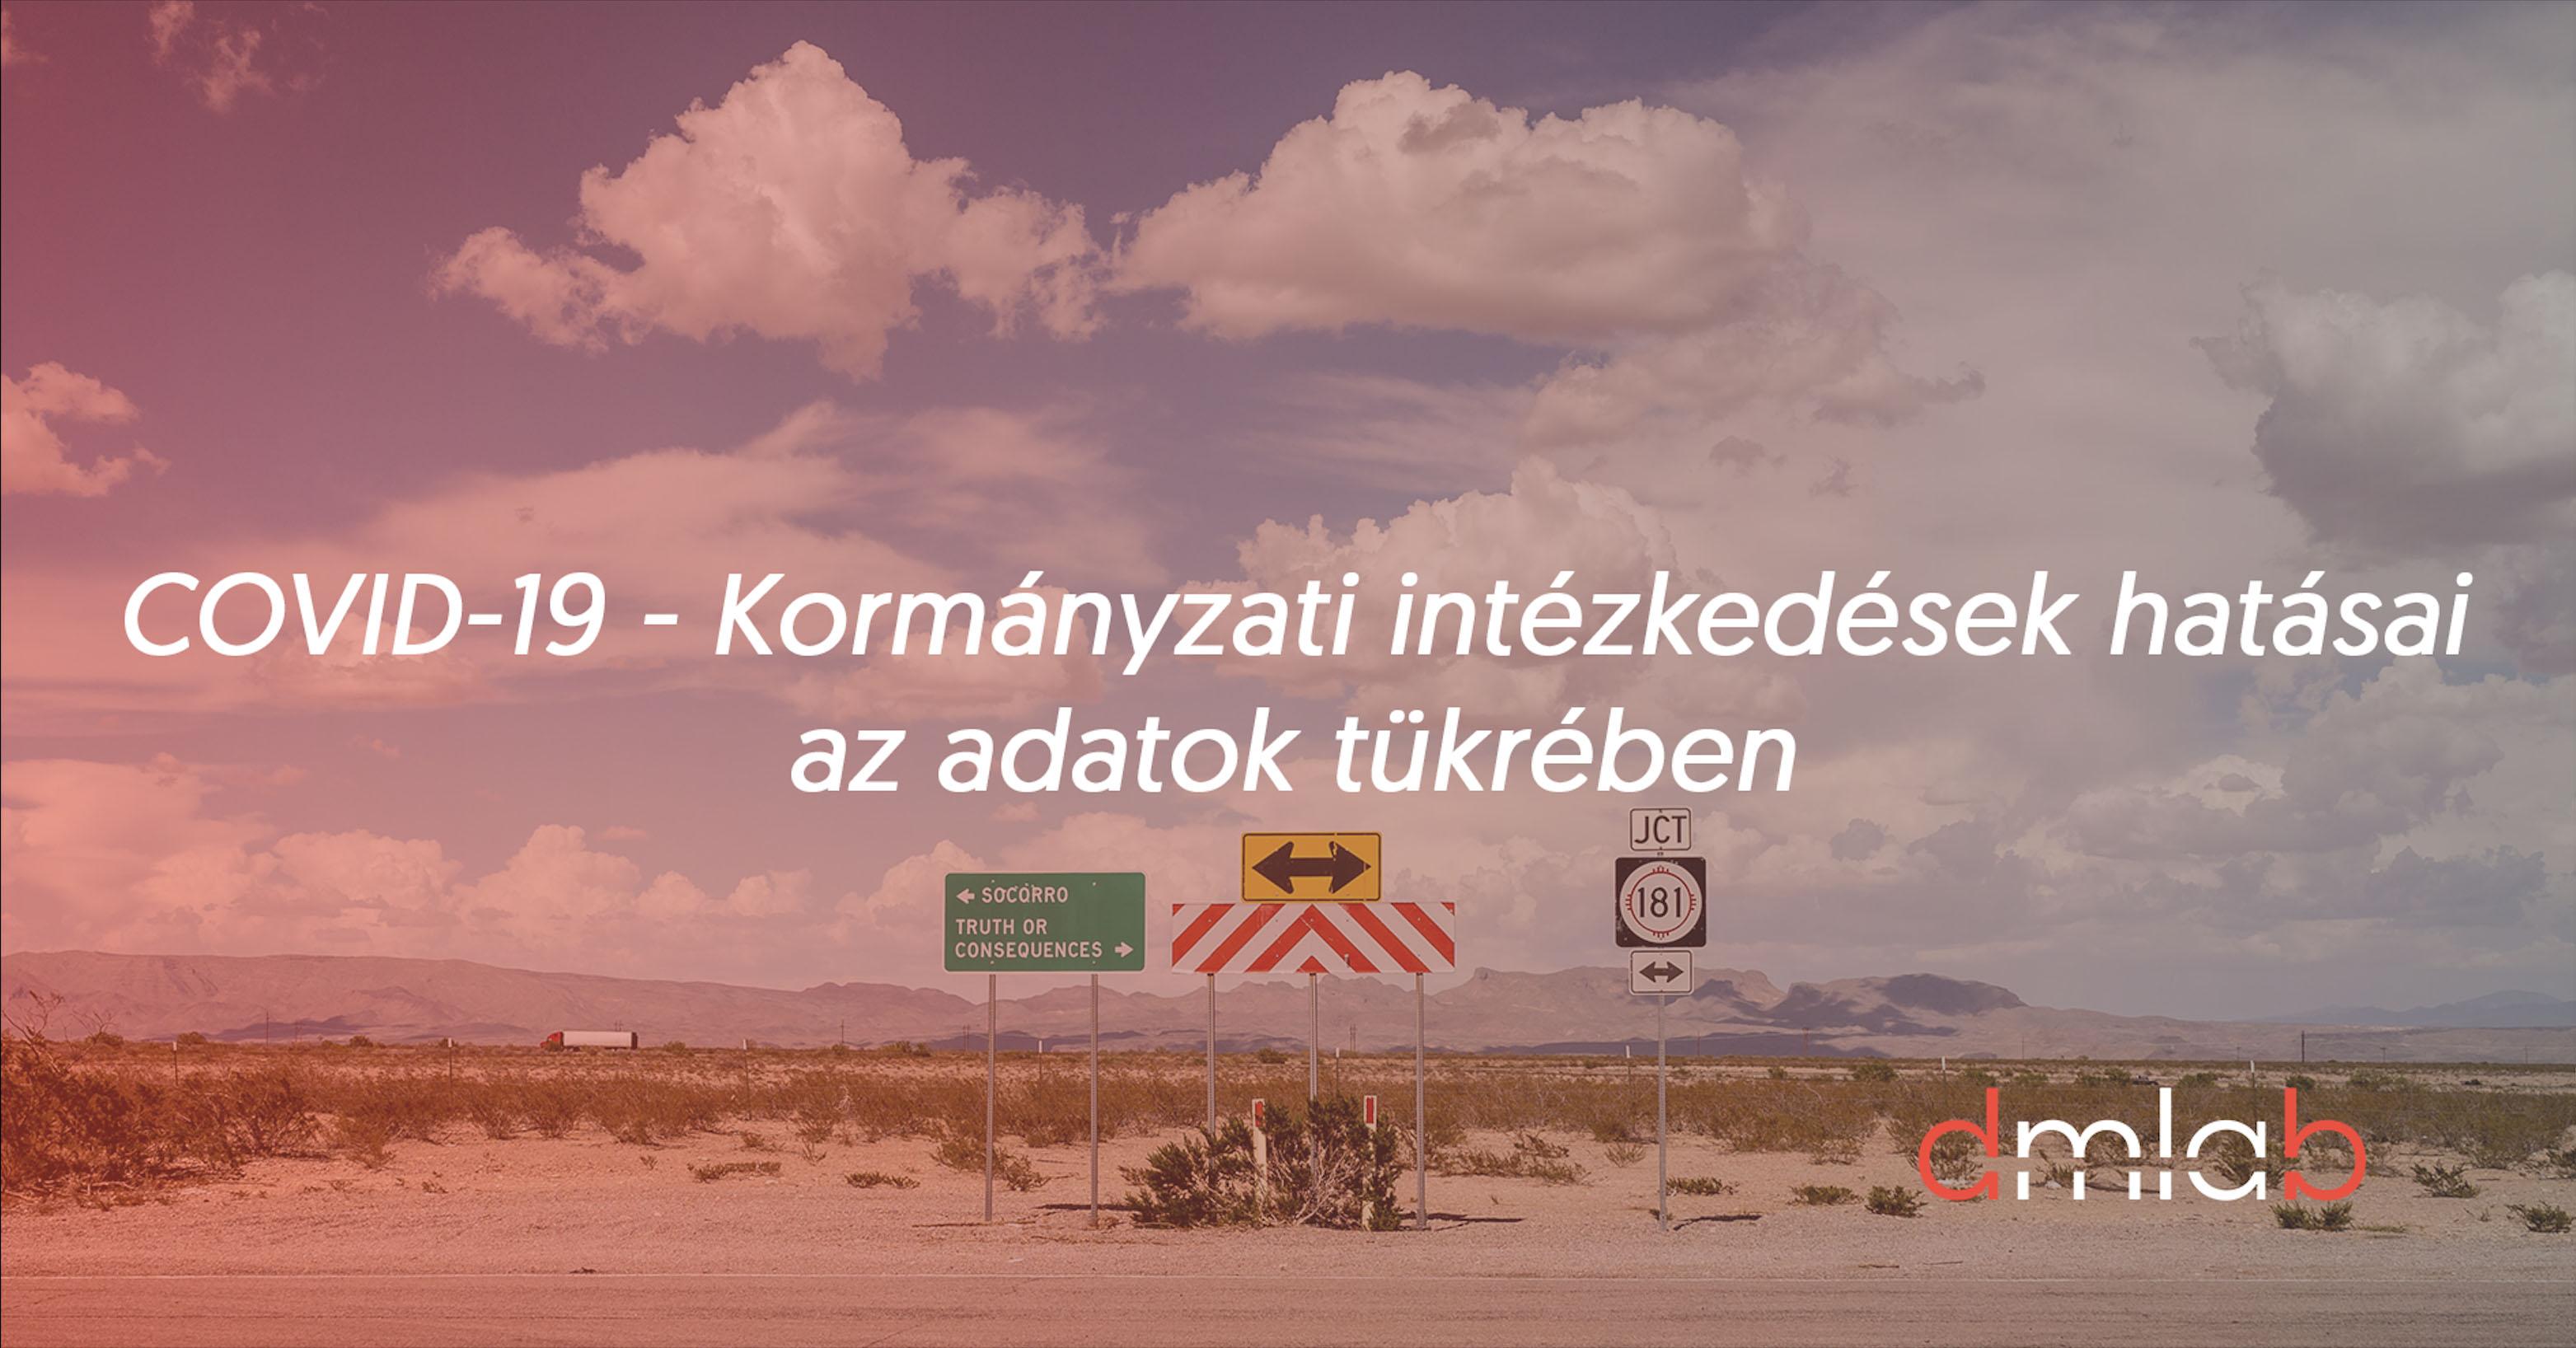 covid-19_korma_nyzati_inte_zkede_sek_hata_sai_az_adatok_tu_kre_ben_1111.jpg